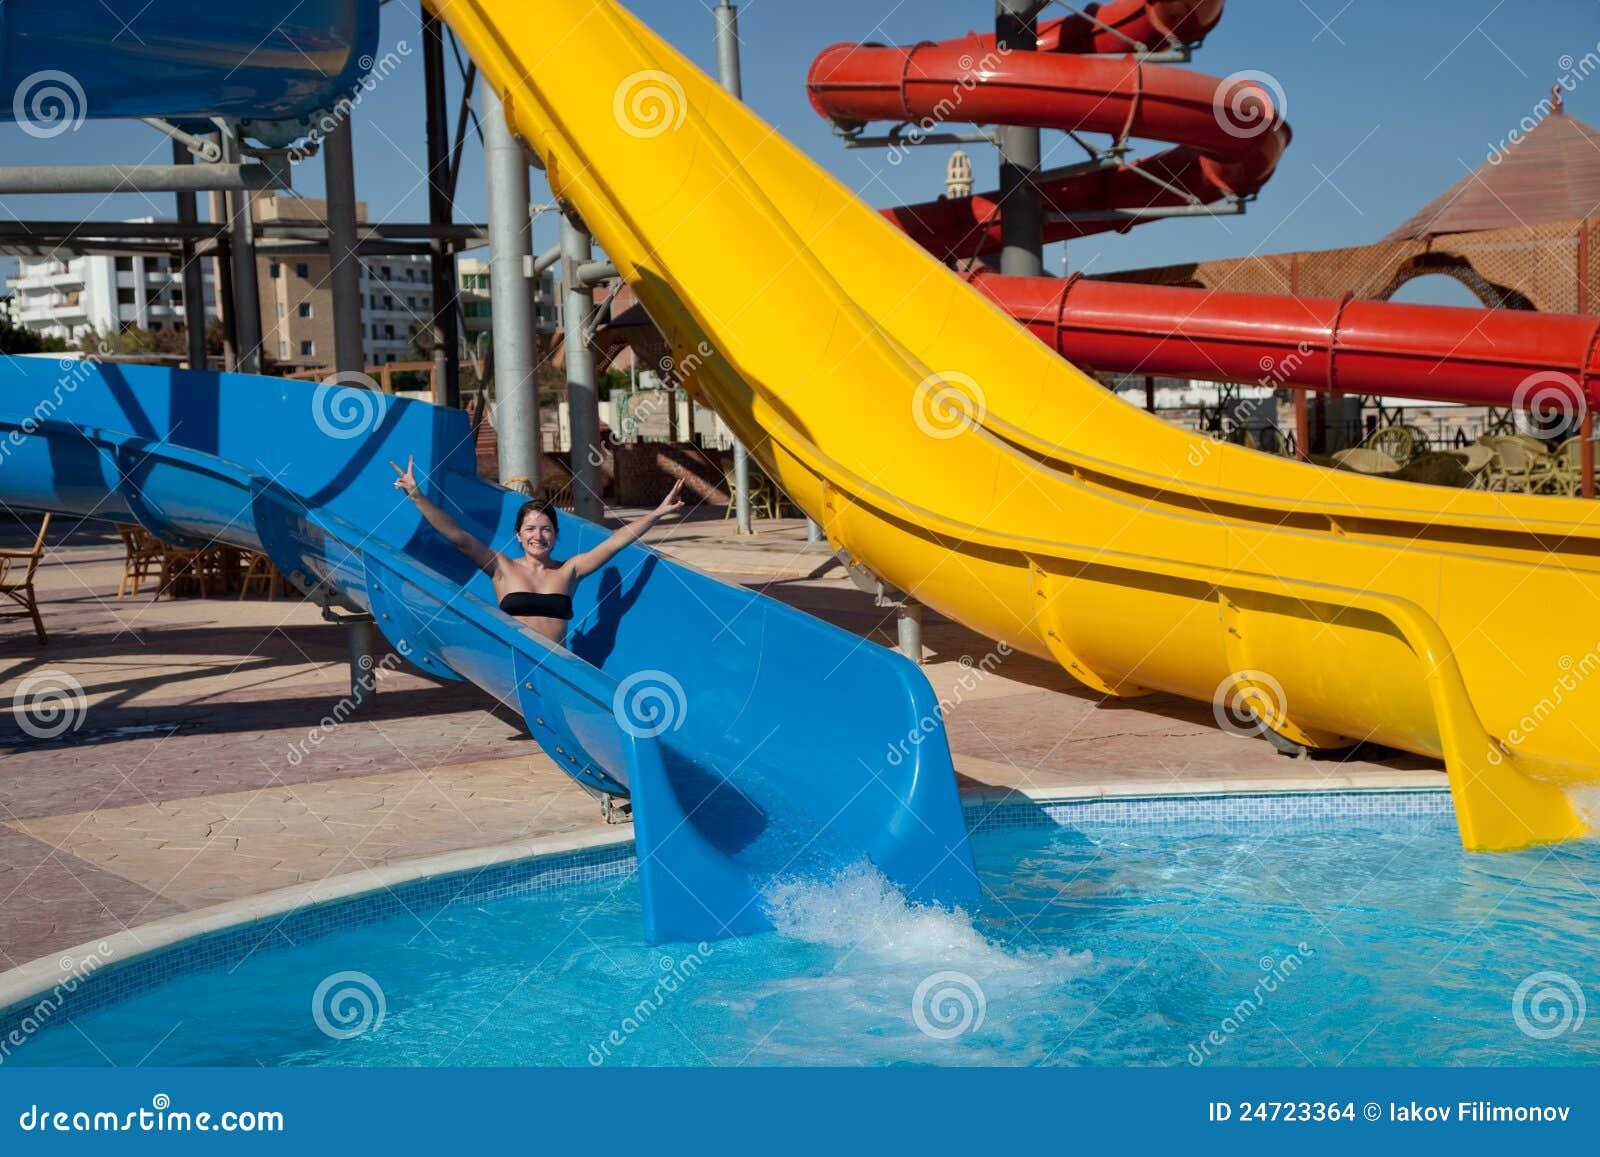 Great Woman On Water Slide 1300 x 957 · 194 kB · jpeg